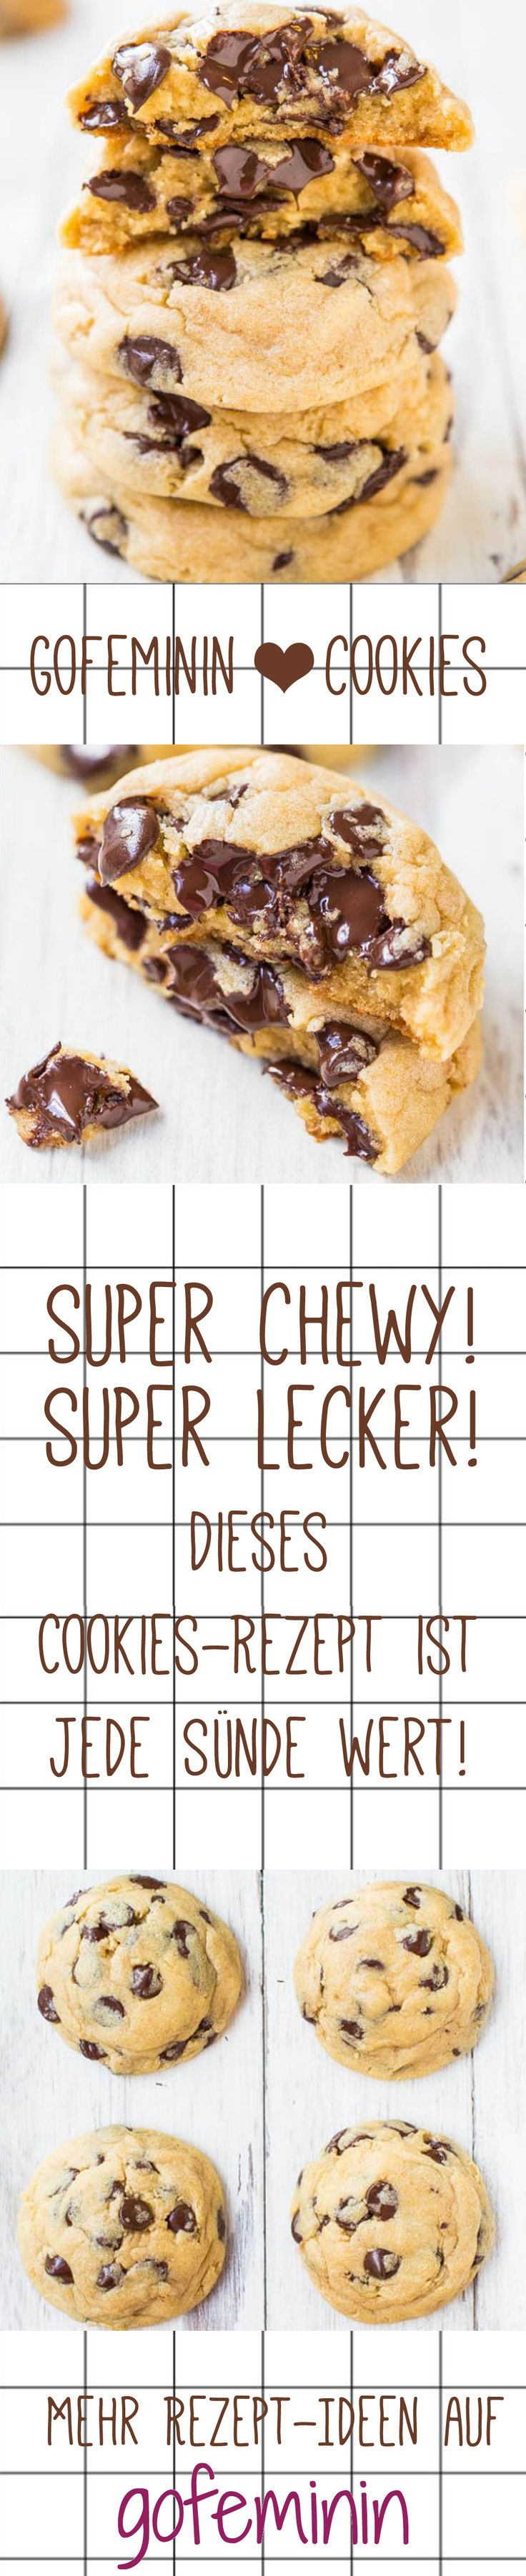 Super chewy, super lecker: Dieses Cookies-Rezept ist jede Sünde wert! Jetzt auf gofeminin.de! #gofeminin #food #cookies #diycookies #recipes